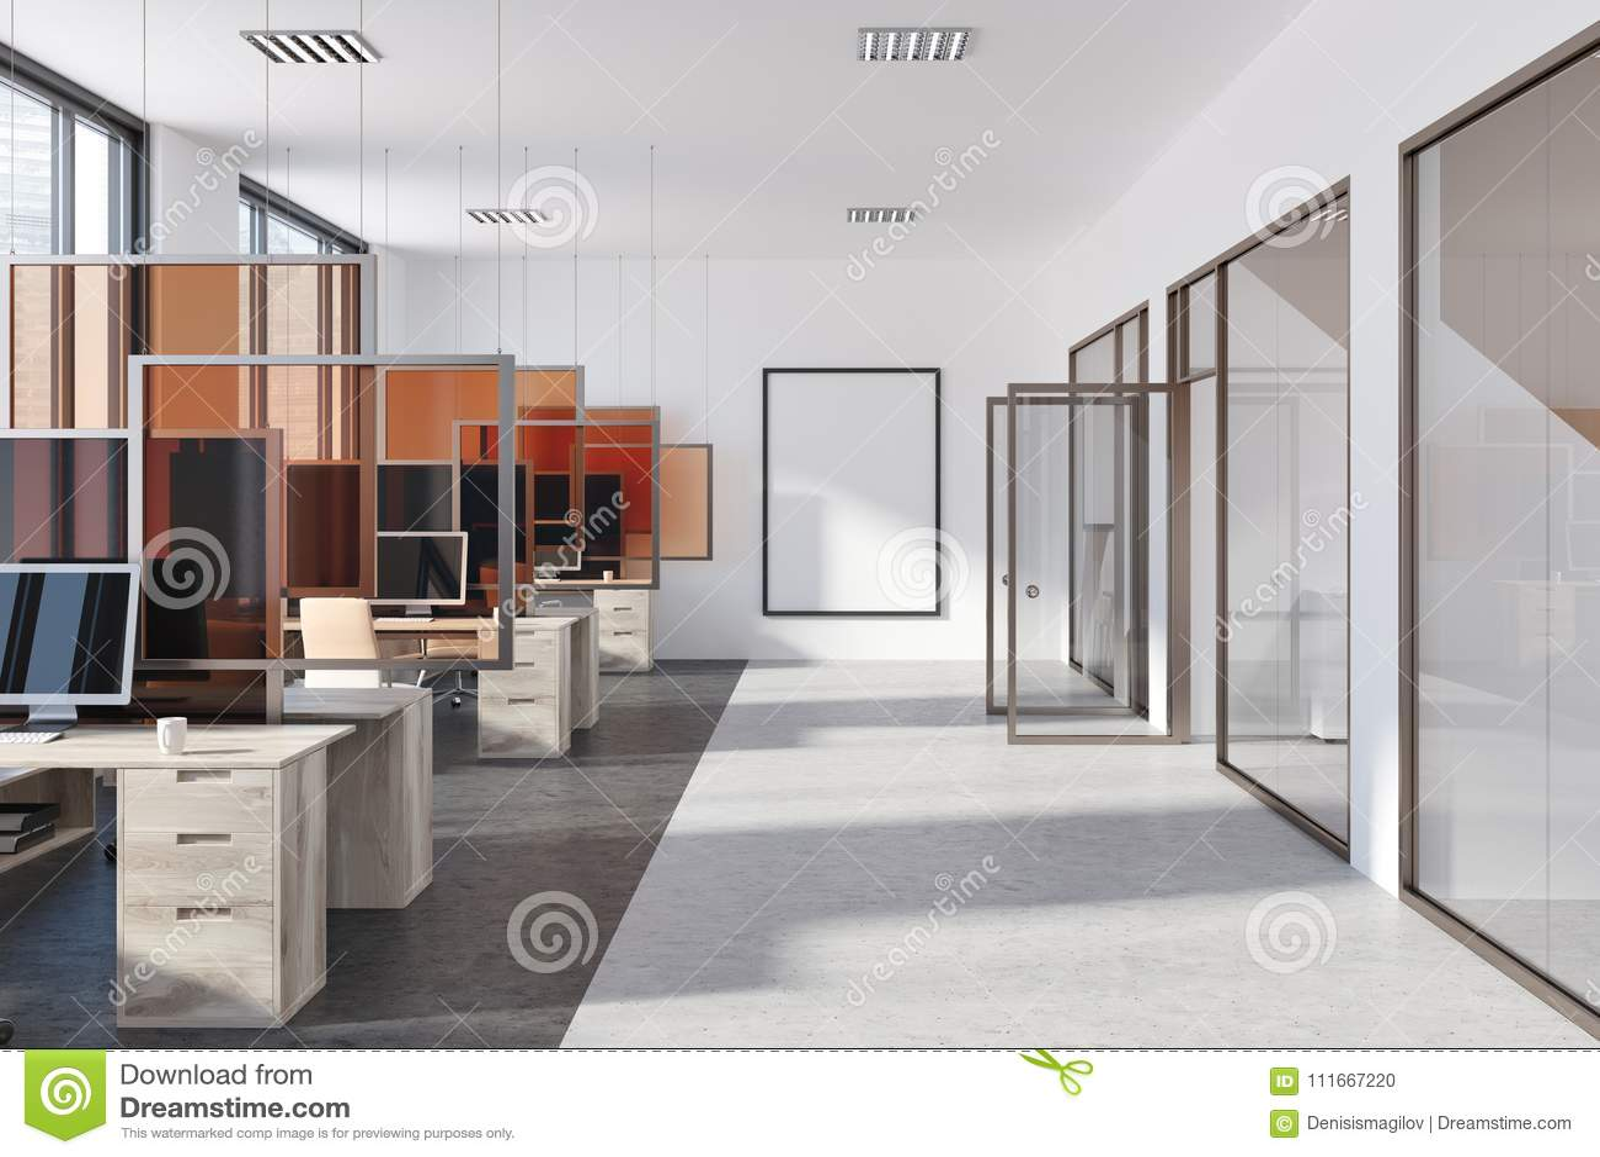 Modern Office Poster Glass Doors Stock Photo Image Of Decor